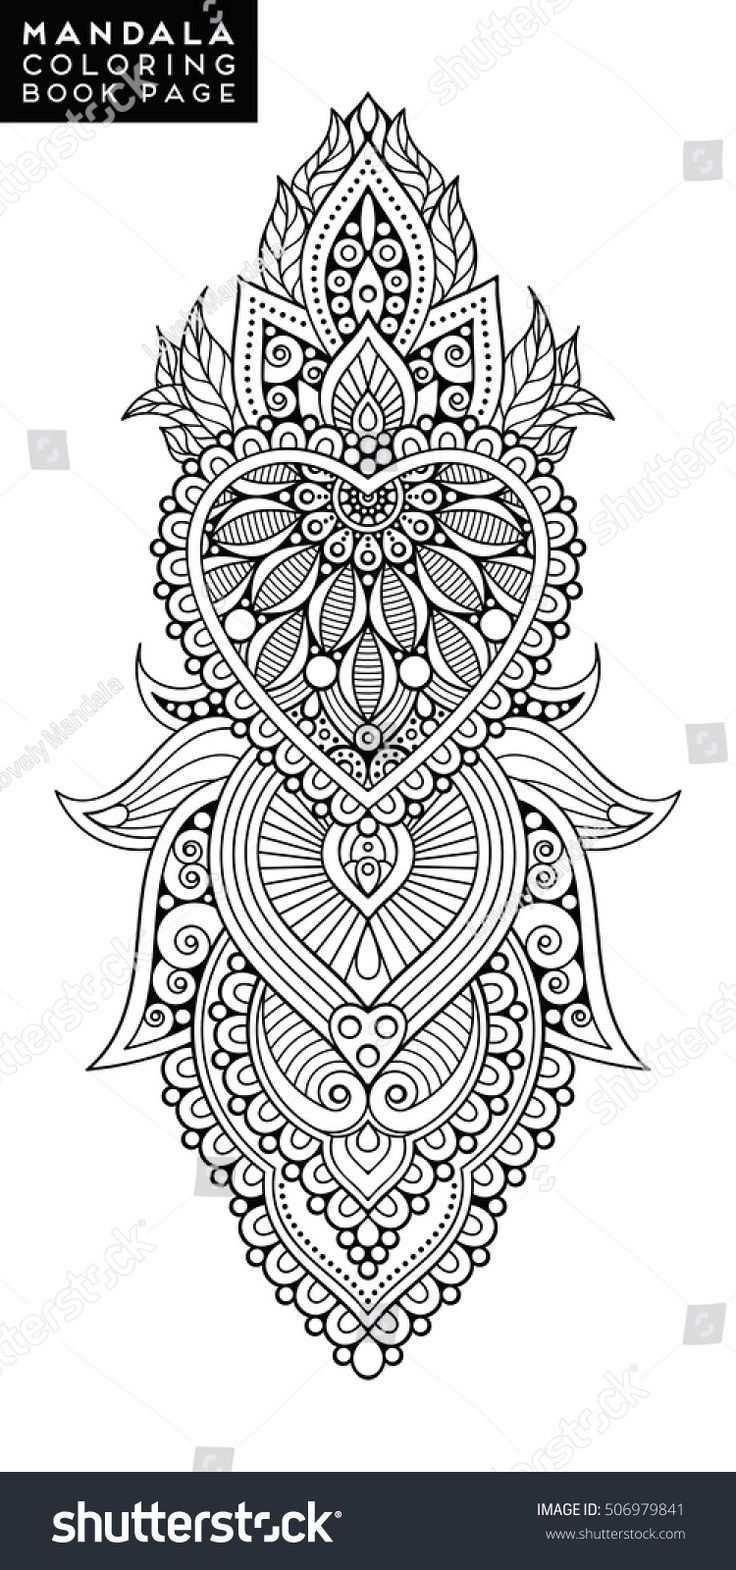 Blumen Mandala Vintage Dekorative Elemente Orientalisches Muster Vektorillustrati 3dt Mandala Coloring Books Mandala Coloring Pages Flower Mandala